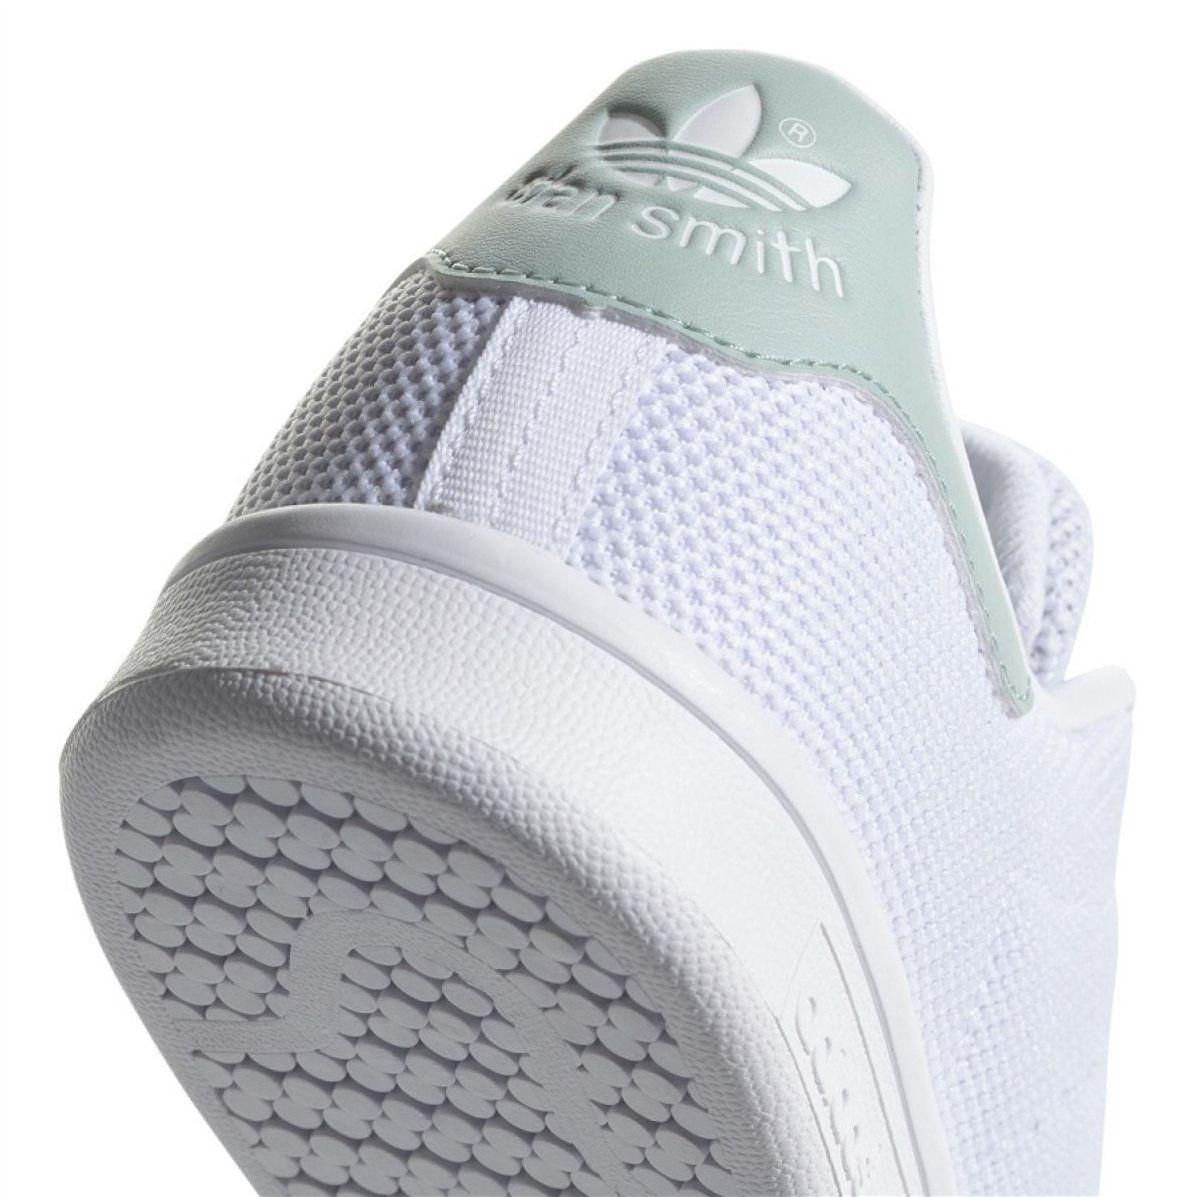 Buty Adidas Originals Stan Smith W Cq2822 Biale Stan Smith Shoes Adidas Originals Stan Smith Adidas Shoes Originals